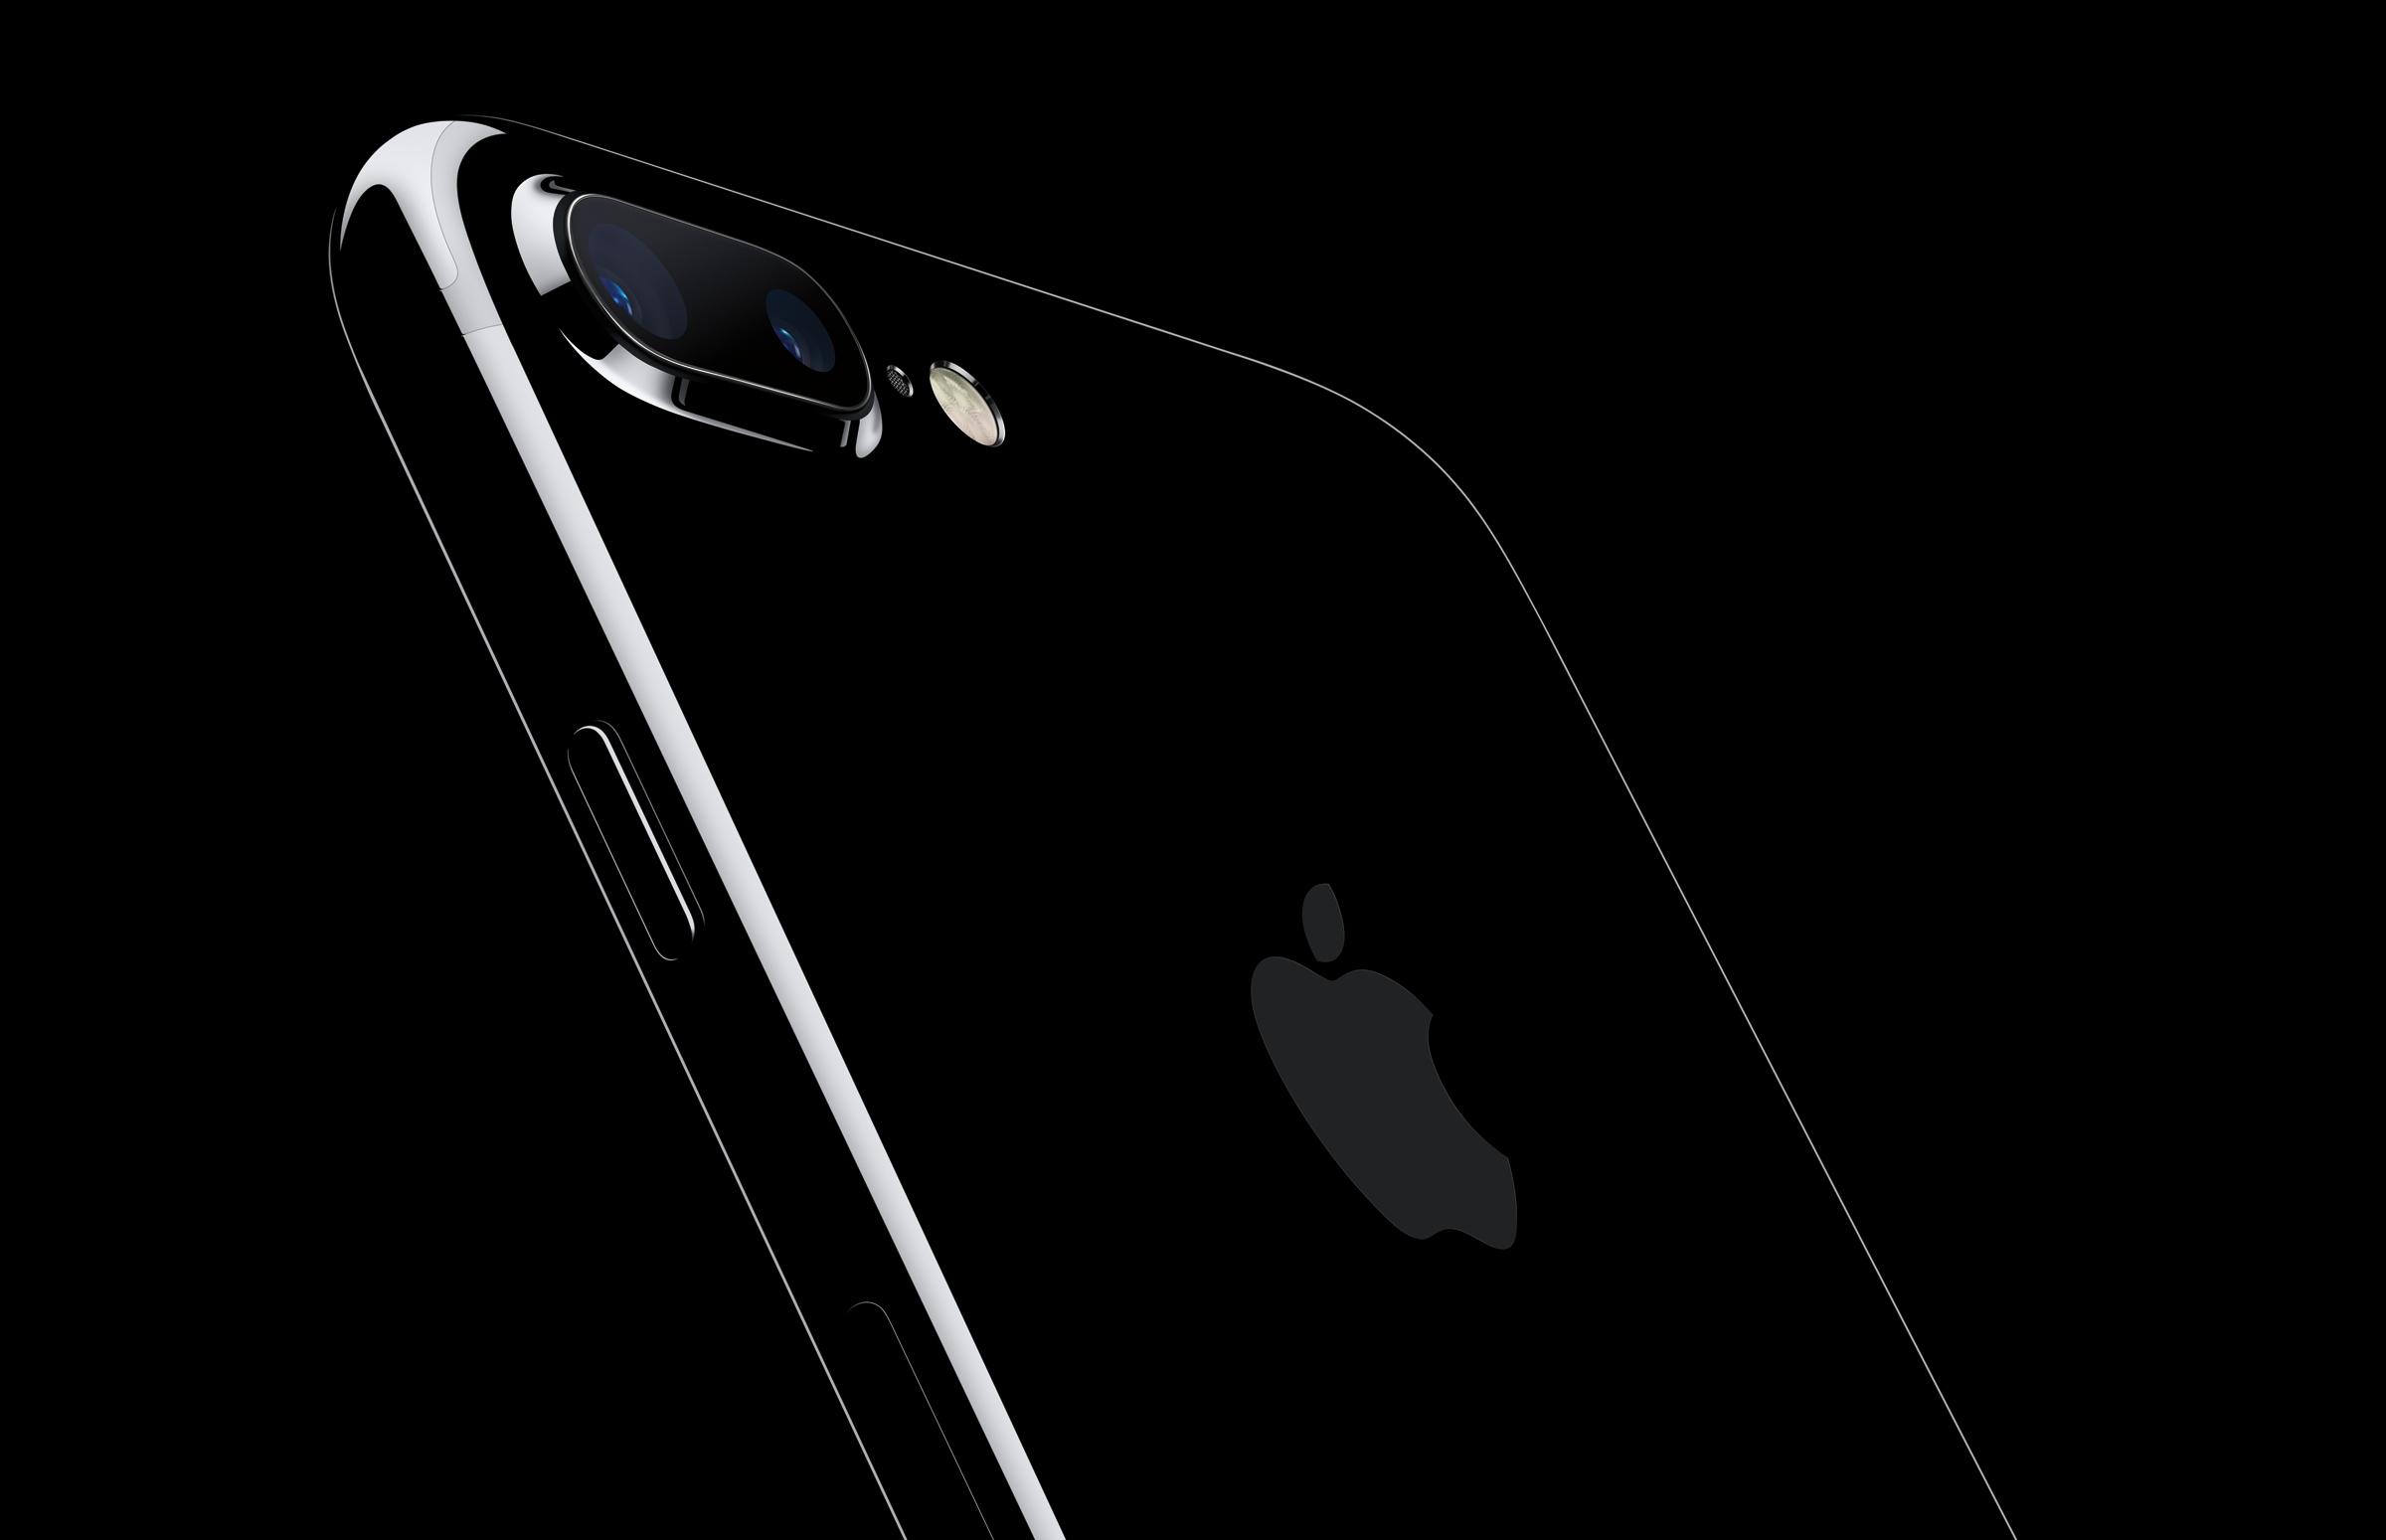 UQ mobile、iPhone 7の価格は実質3.4万円から。発売日は12月20日に